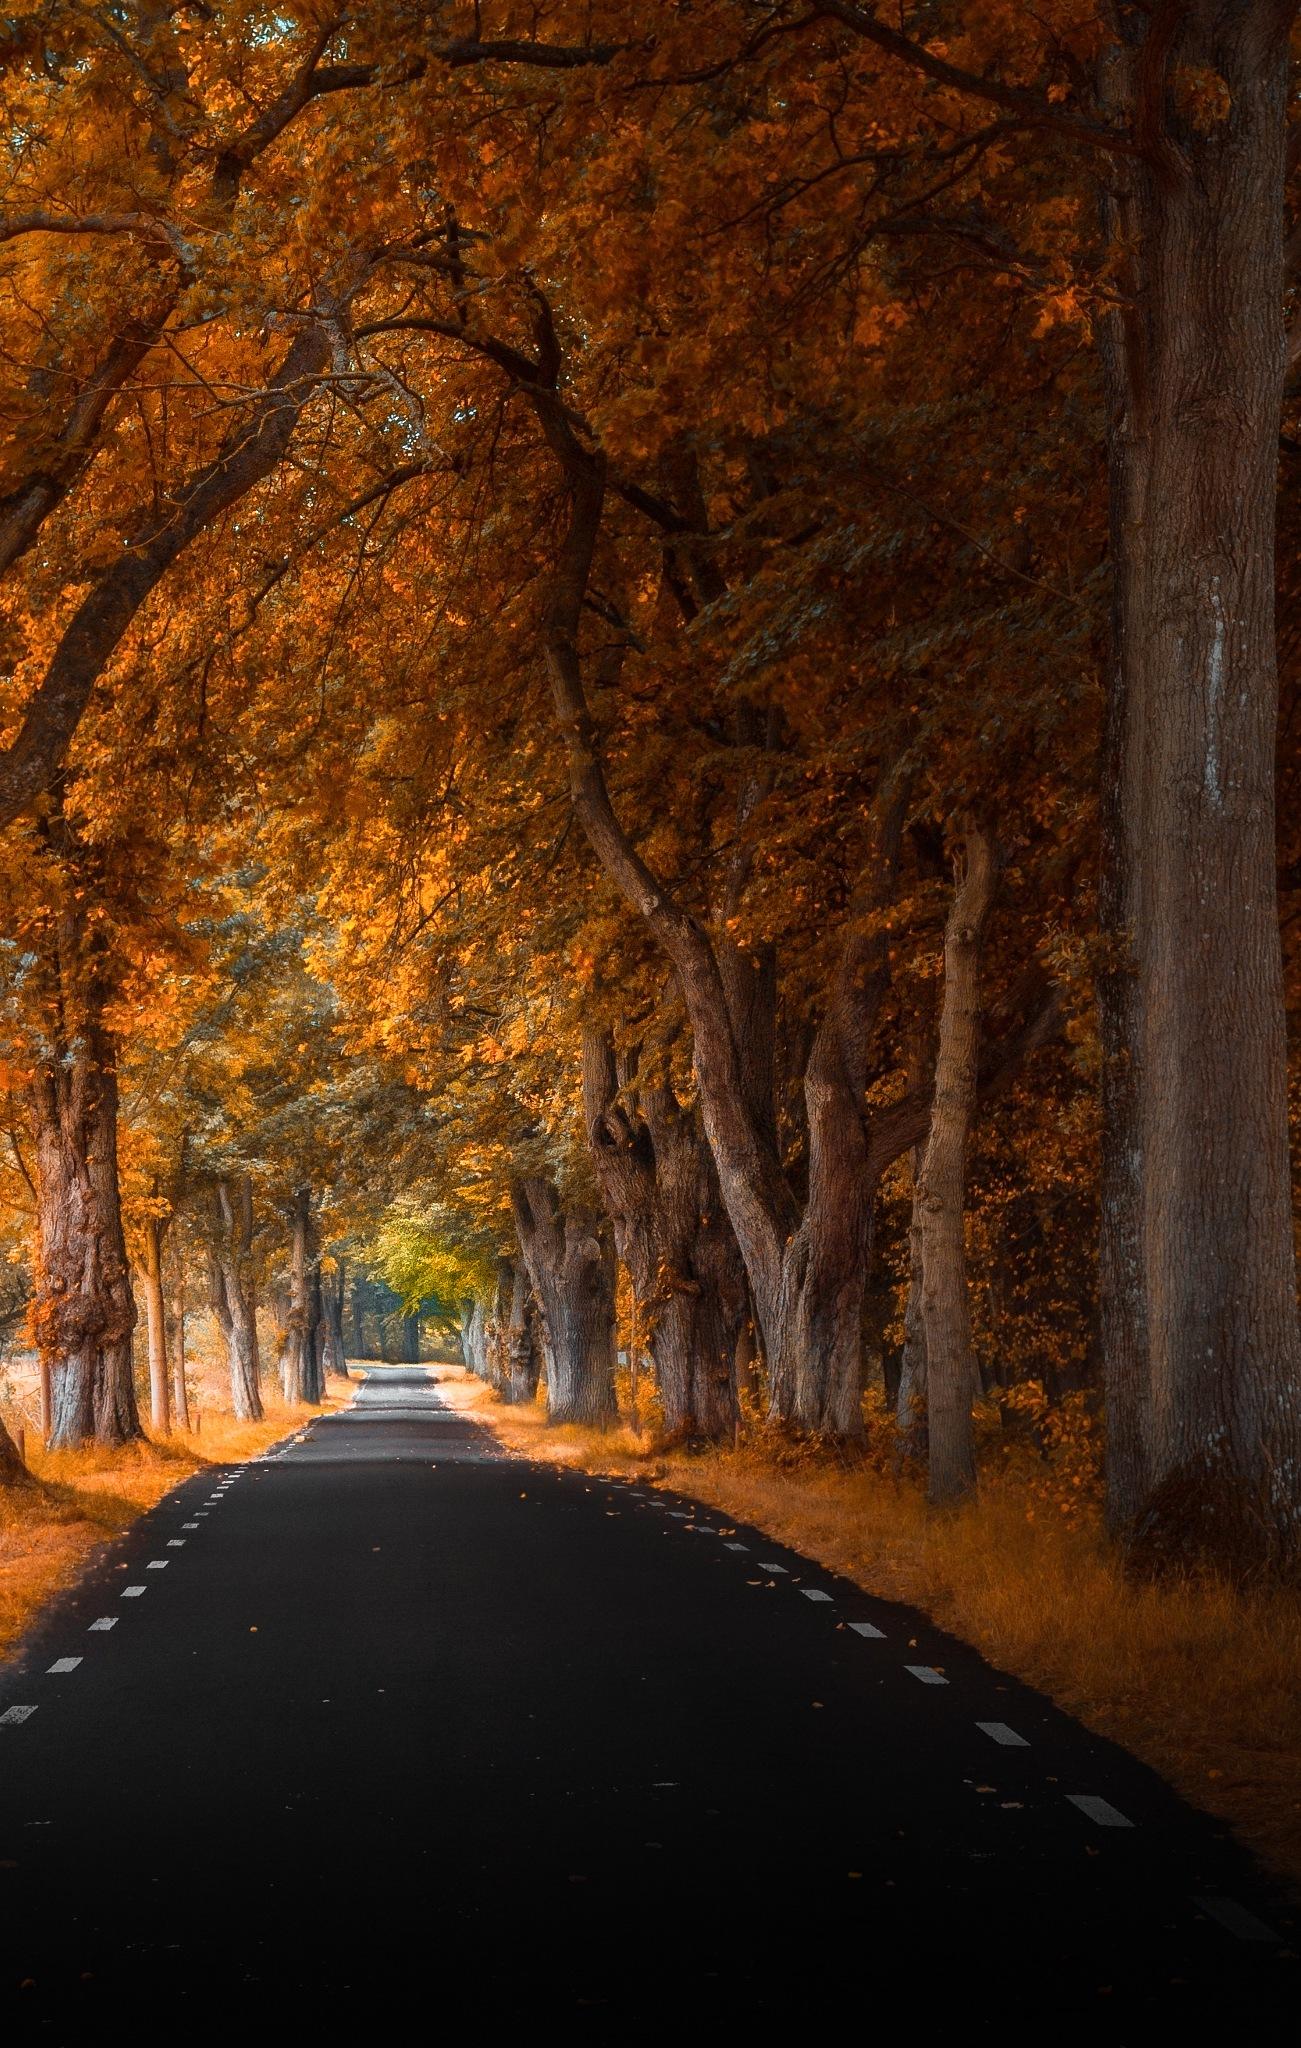 Rosendal road (part 3) by Göran Ebenhart